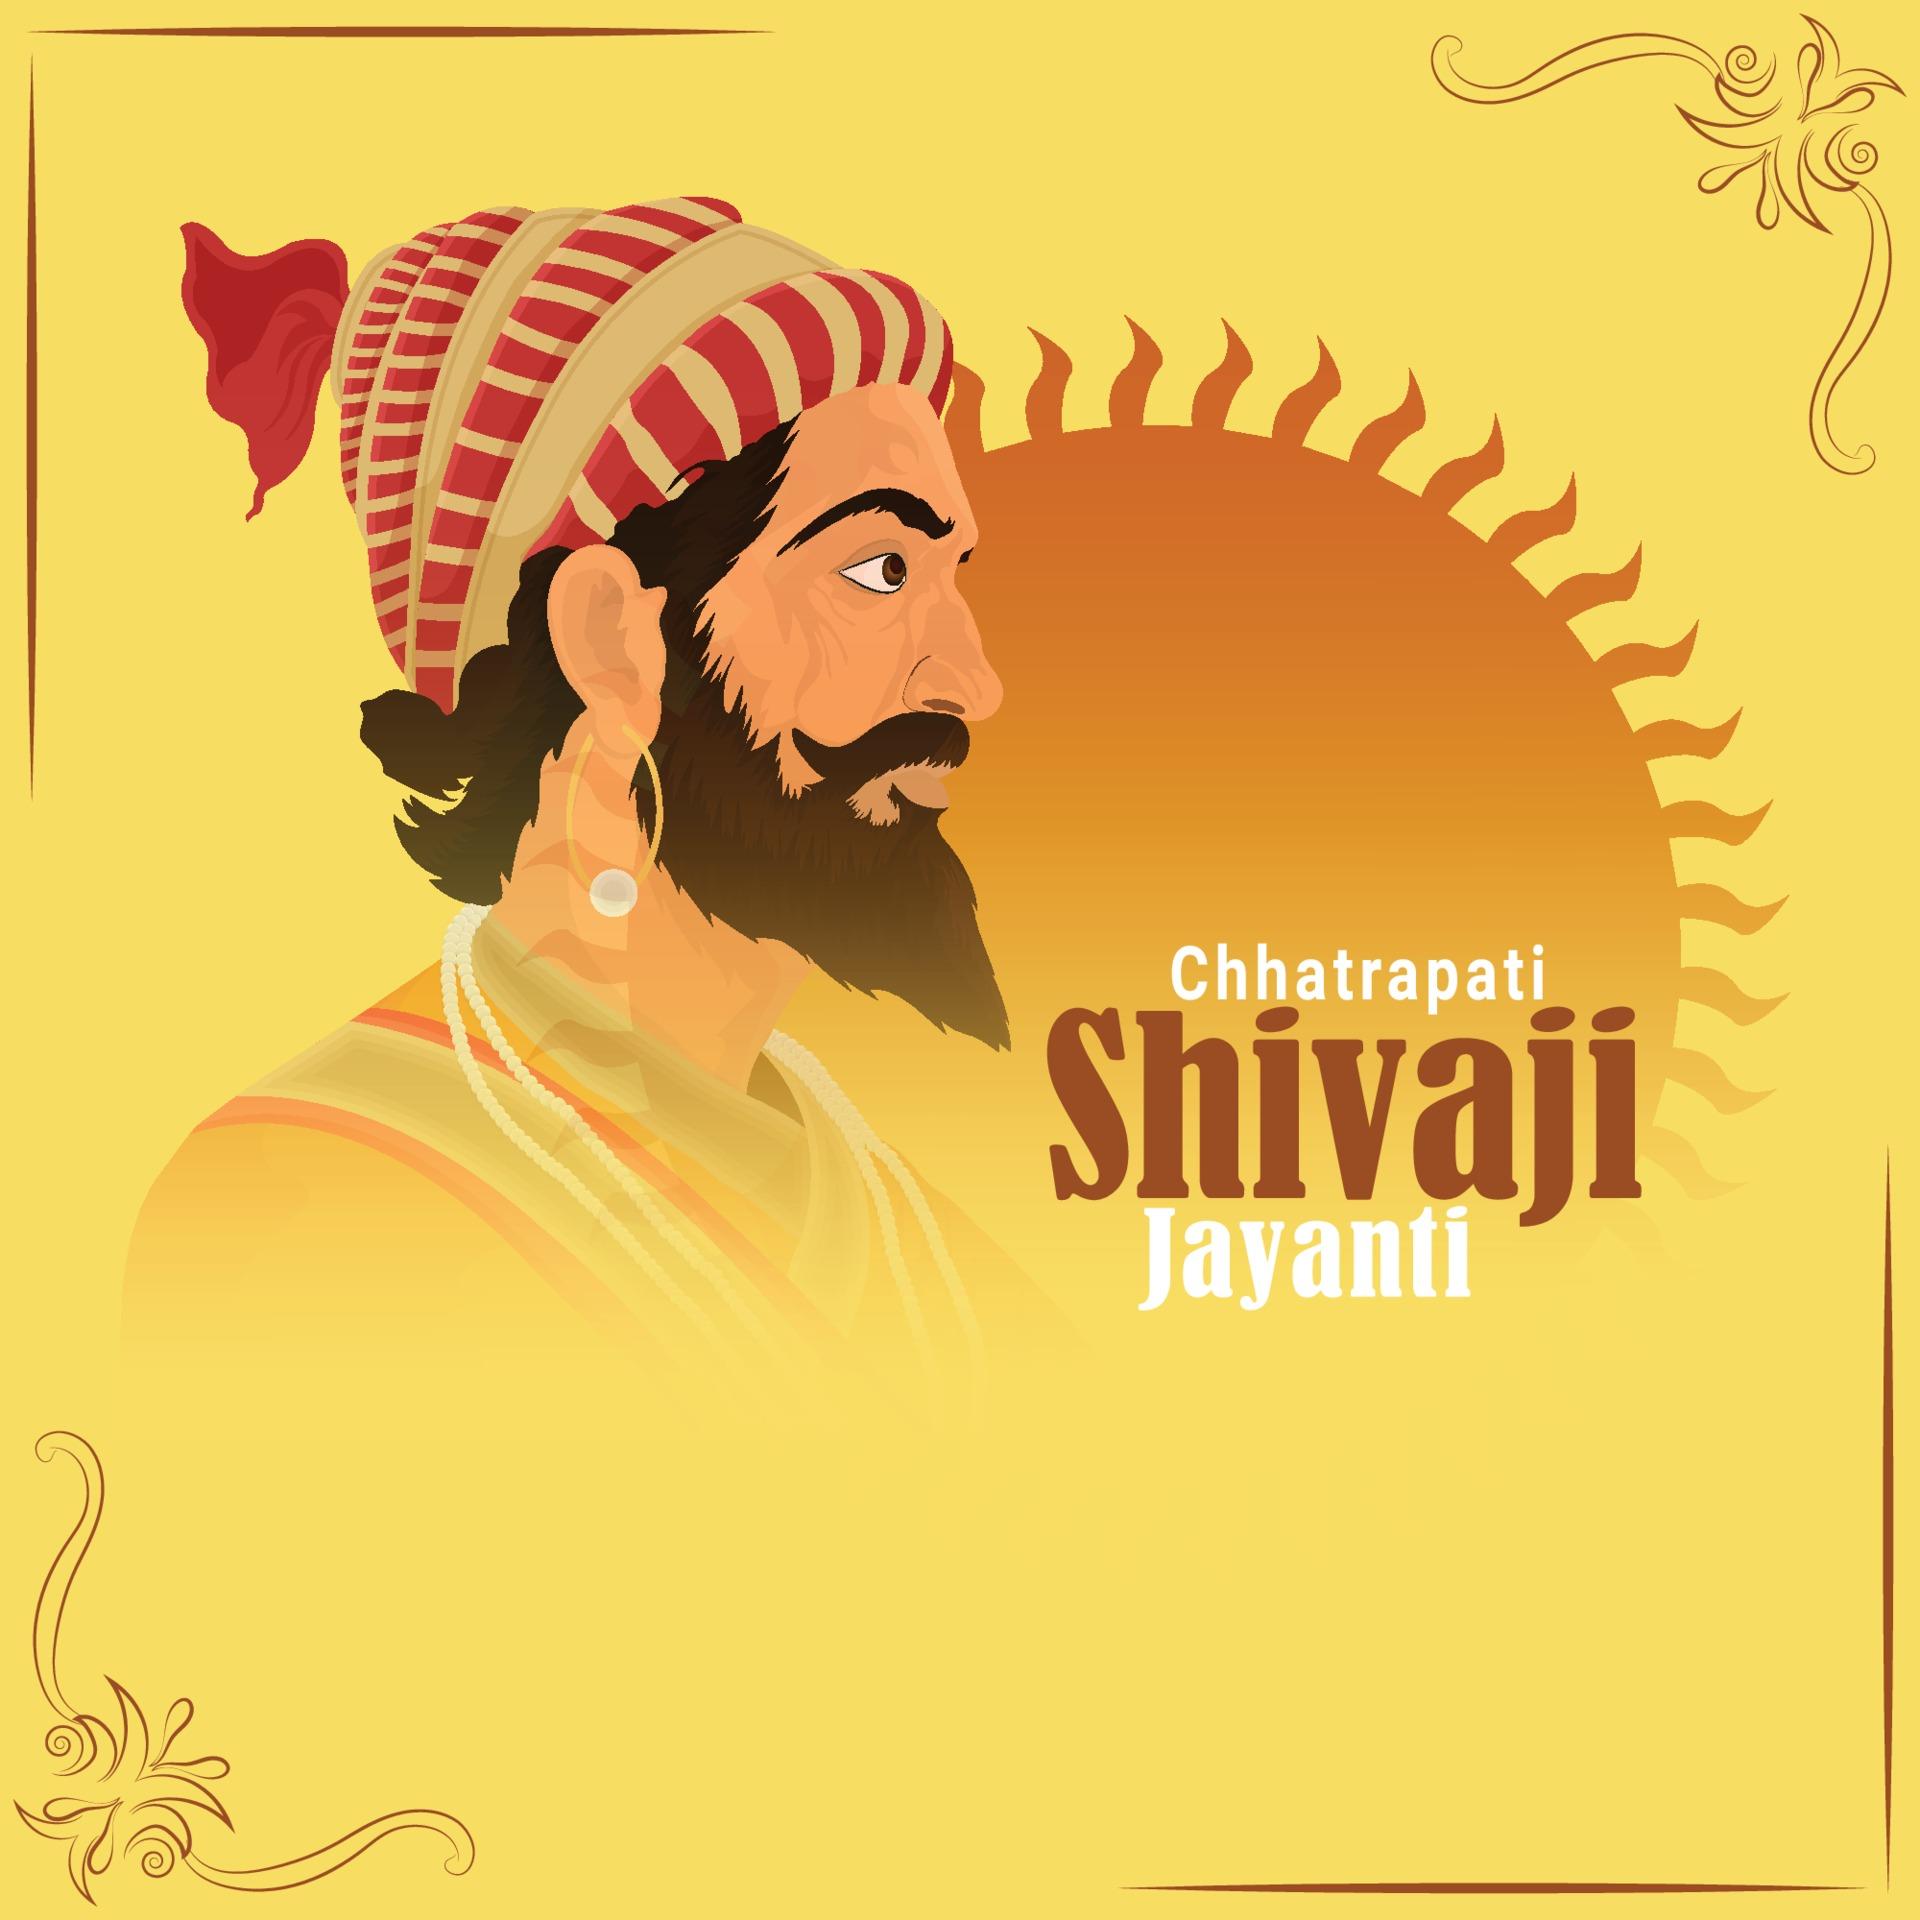 Chhatrapati Shivaji Maharaj Jayanti 20 Vektor Kunst bei Vecteezy